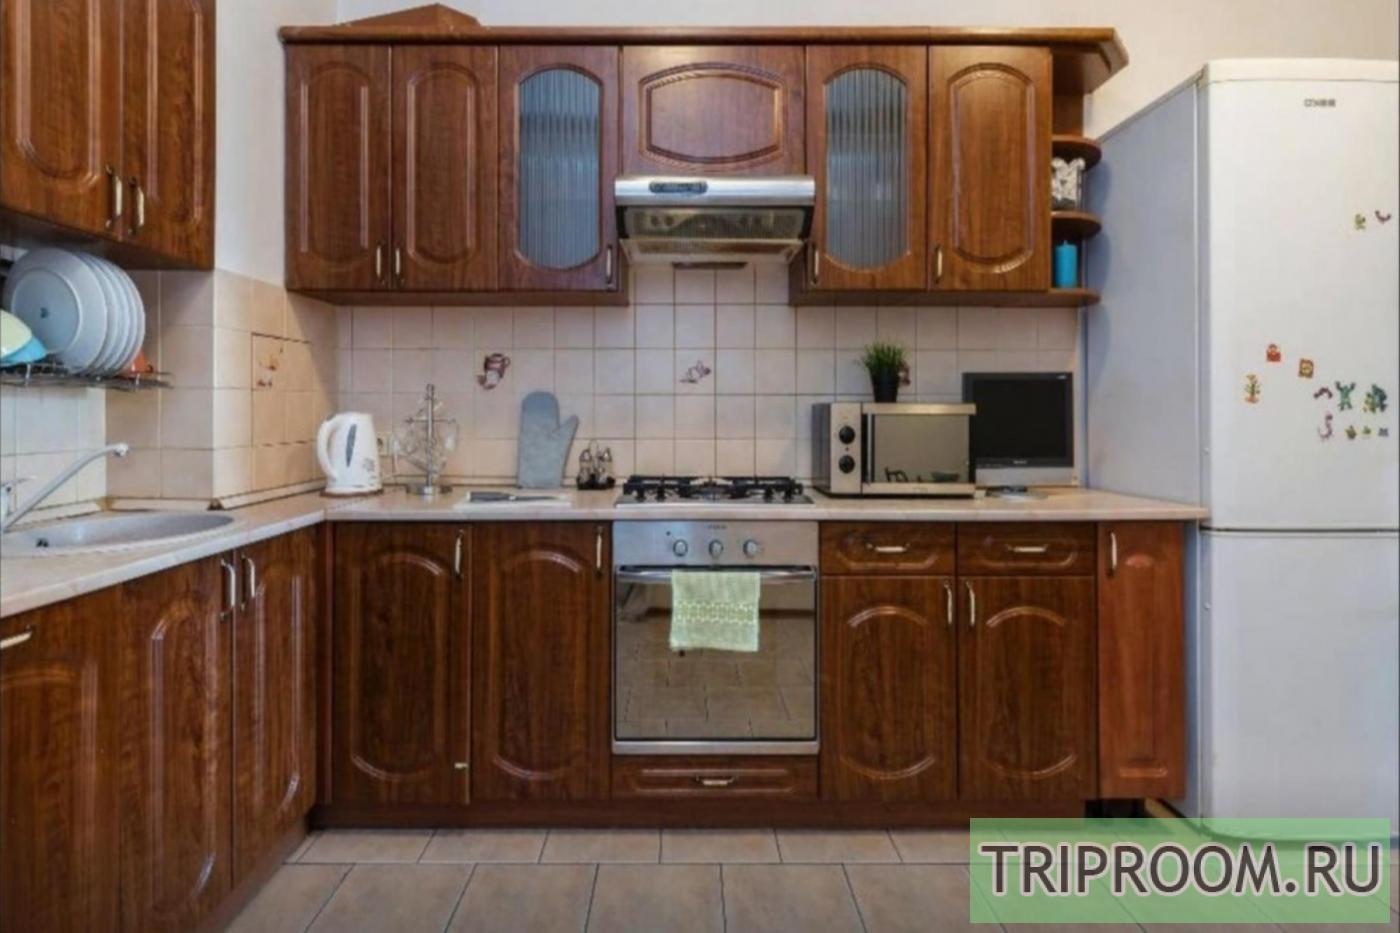 1-комнатная квартира посуточно (вариант № 33441), ул. проспект Соколова, фото № 3